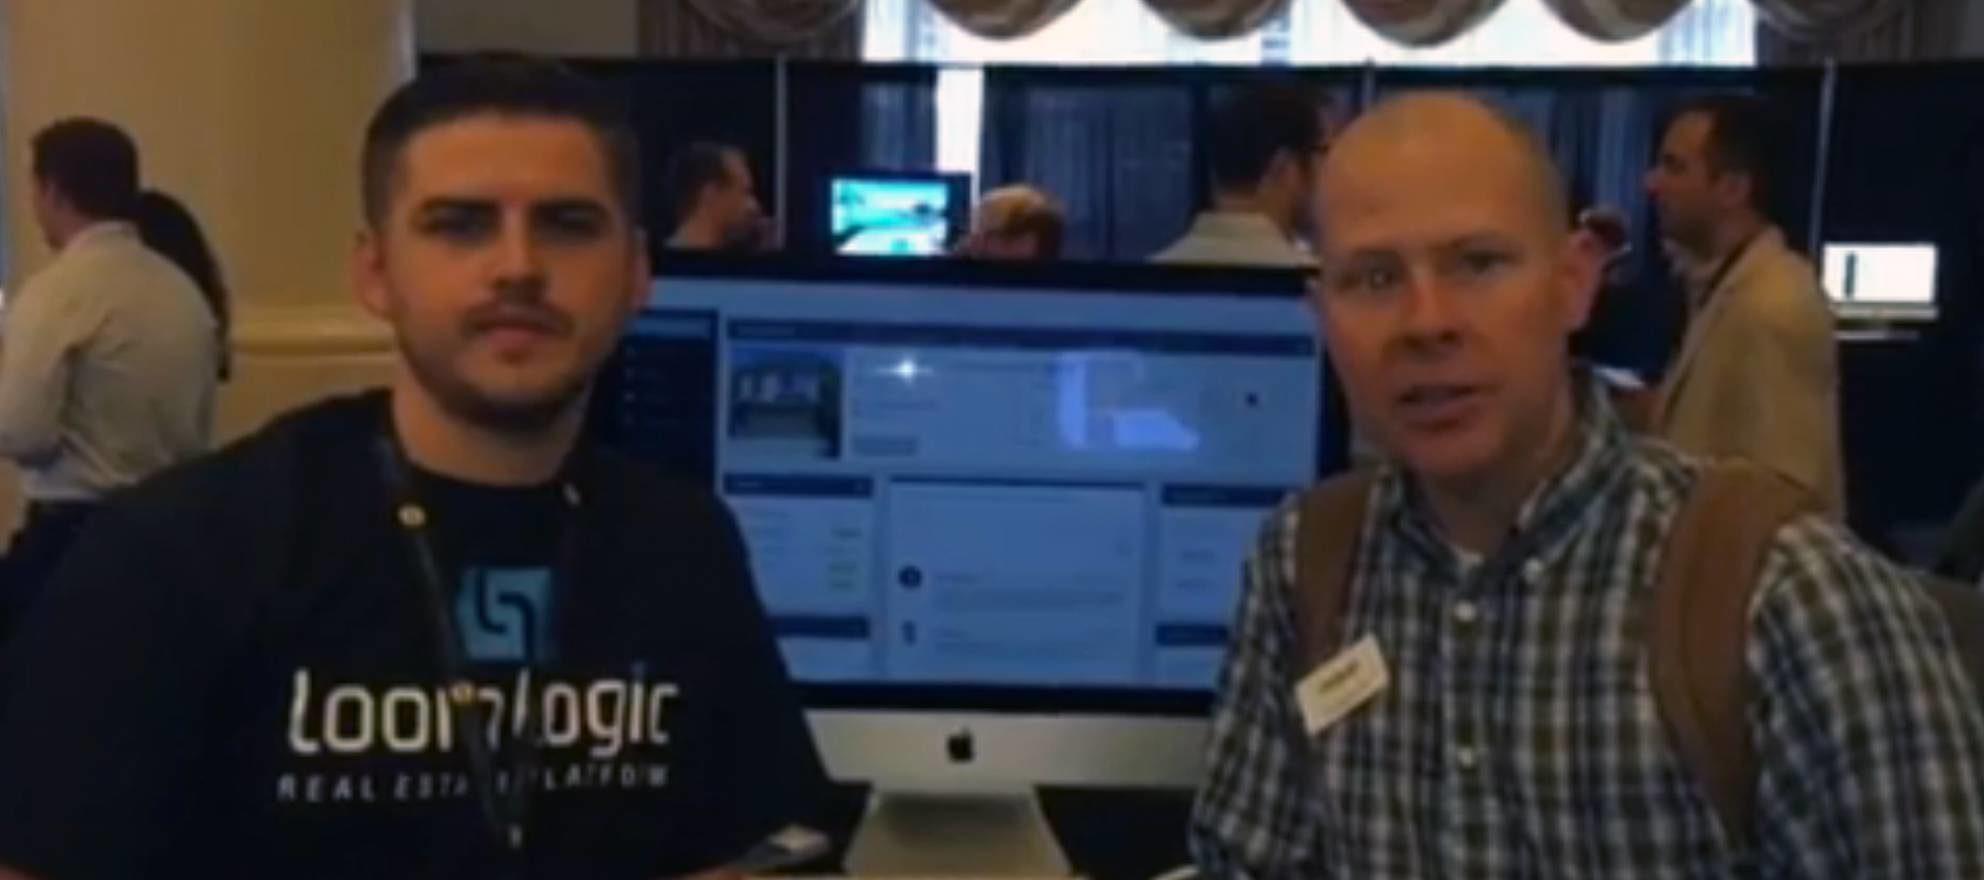 On the Startup Alley floor: LoomLogic